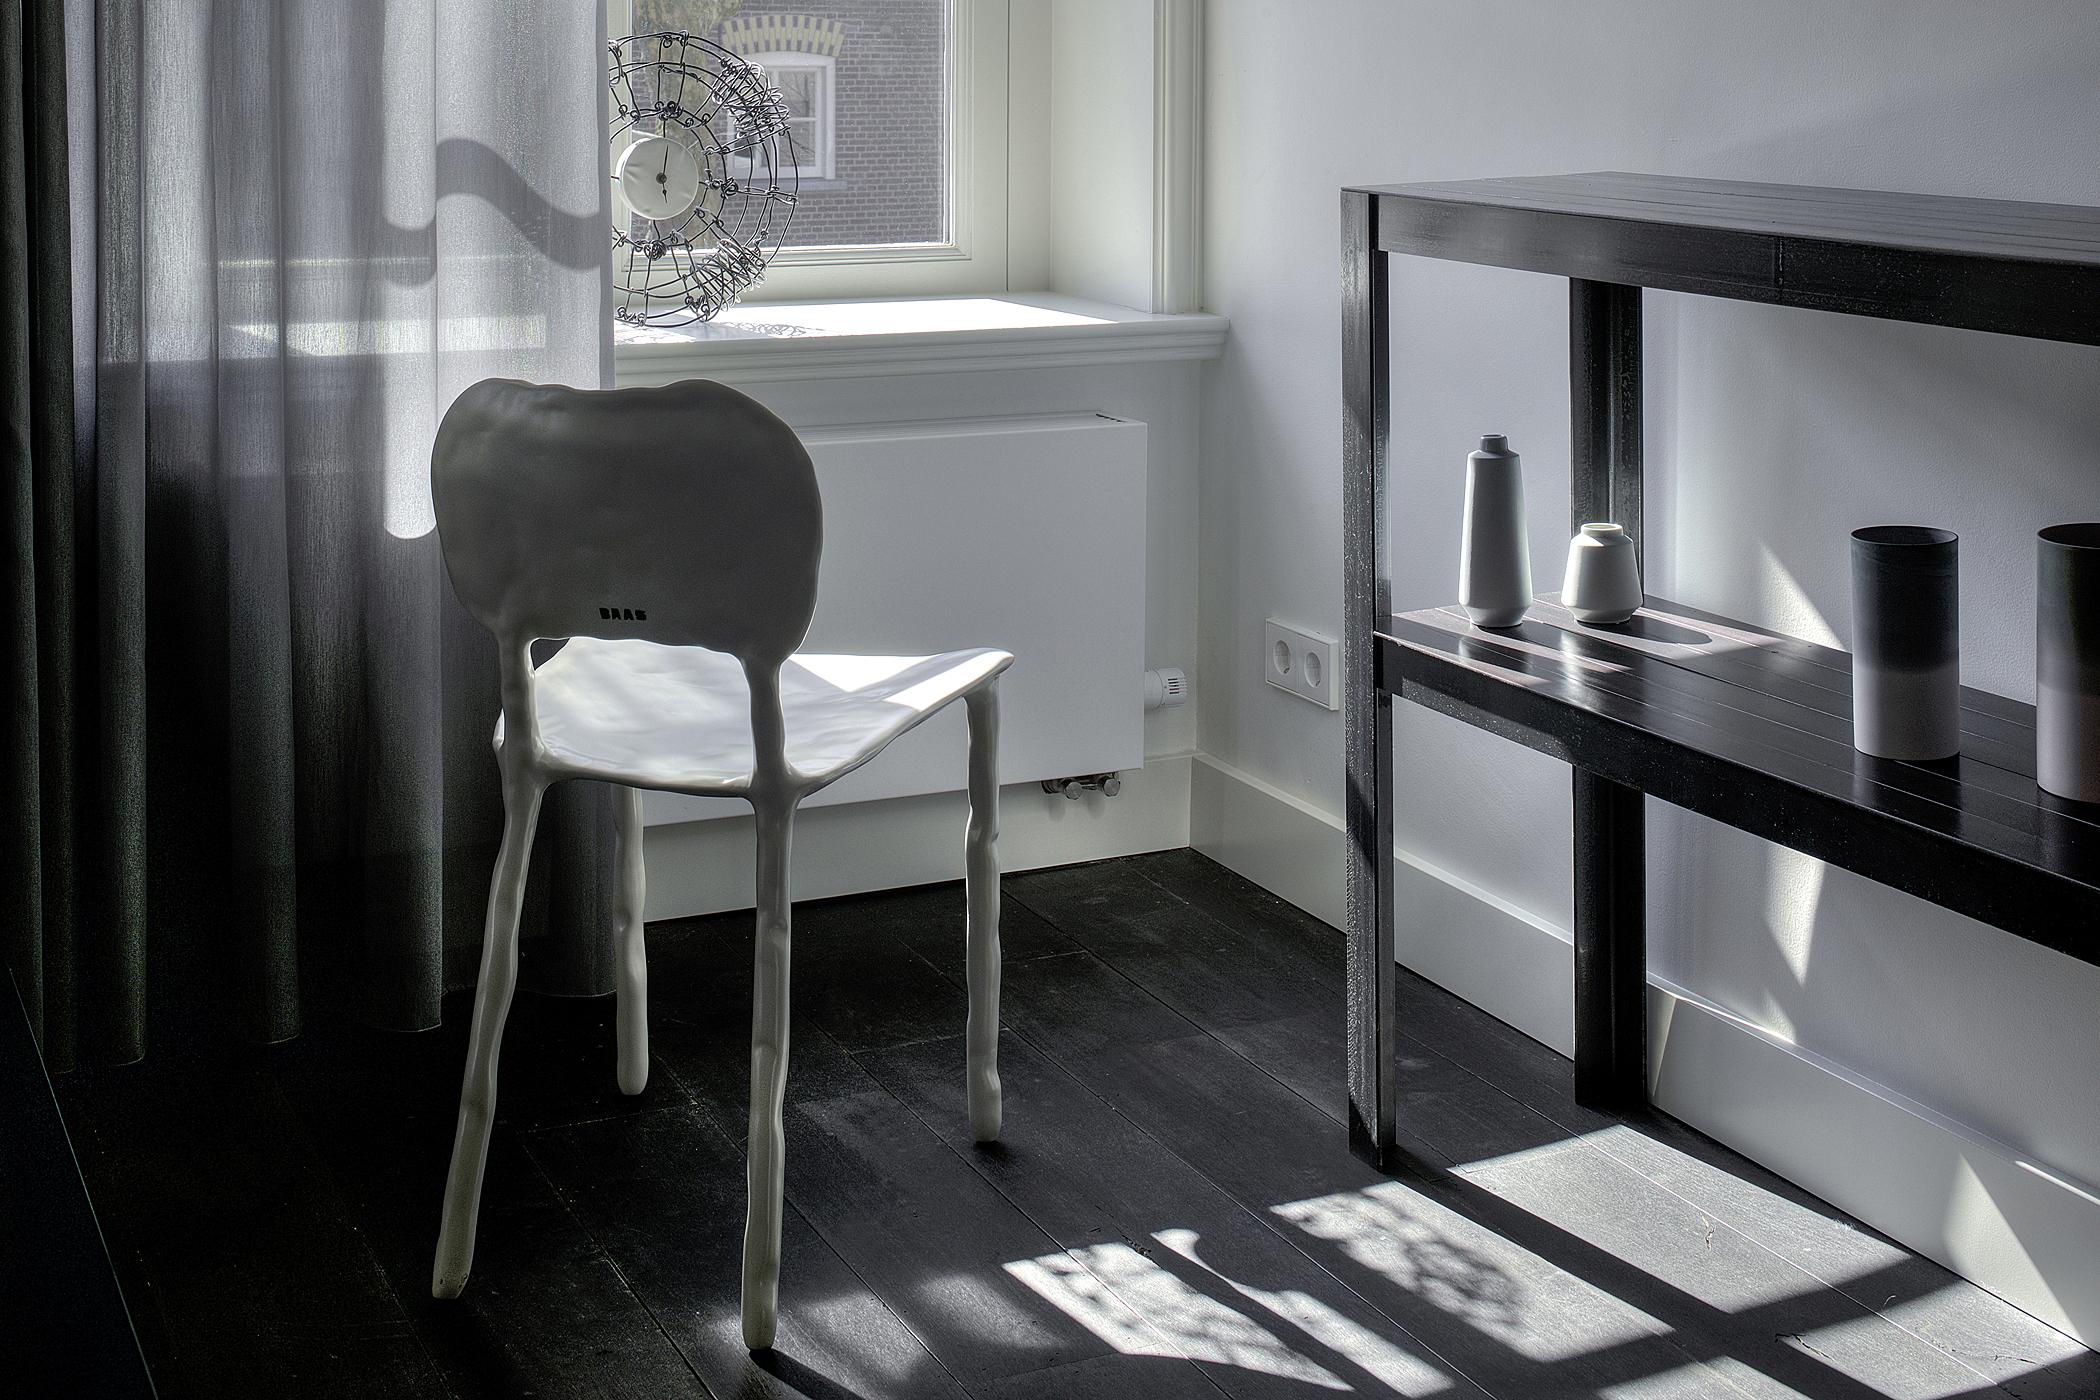 Kazerne Family Suite Bedroom Baas VanEijk Image Patrick Meis